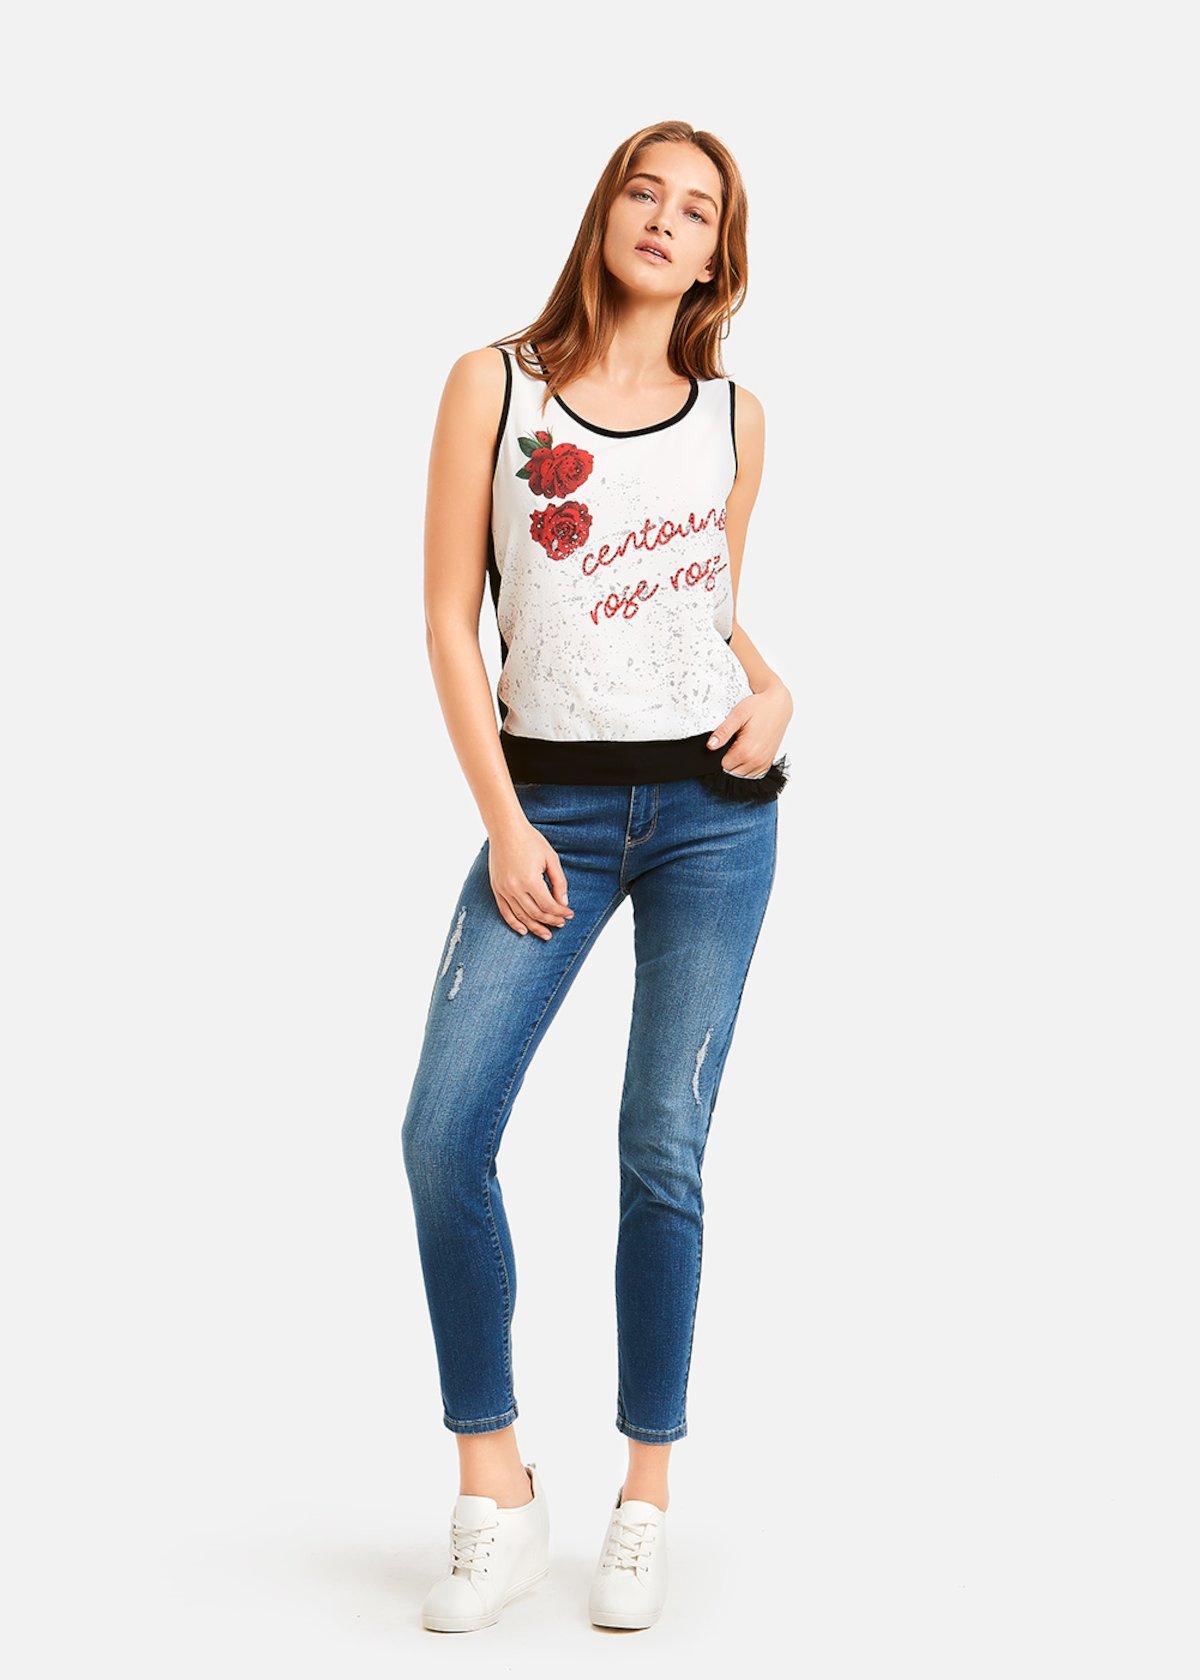 Dider 5 Pocket skinny jeans - Medium Denim - Woman